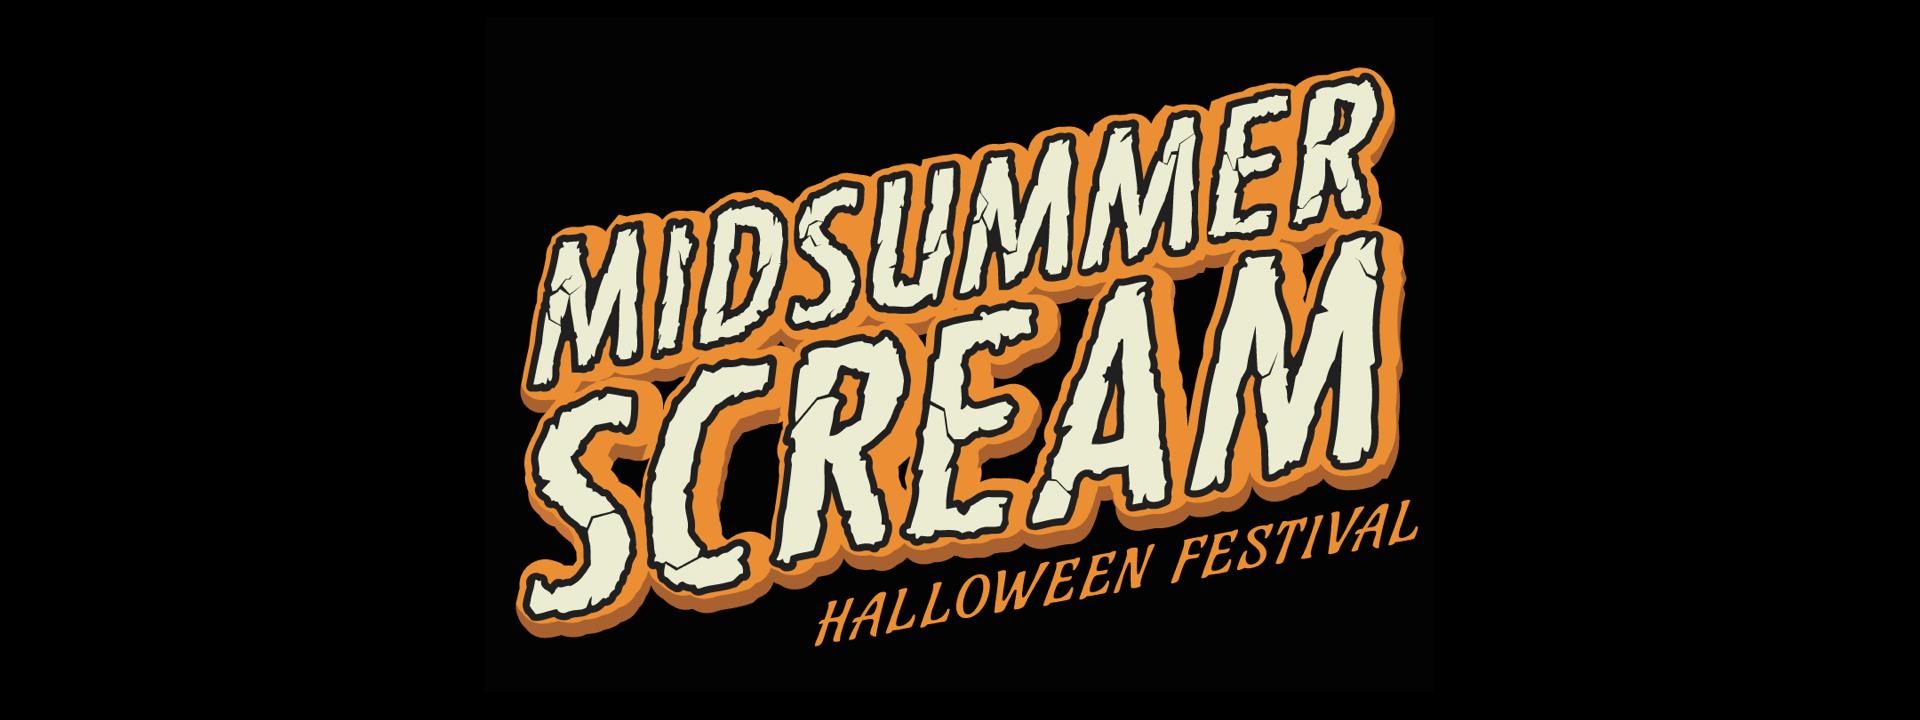 (Image courtesy of Midsummer Scream.)